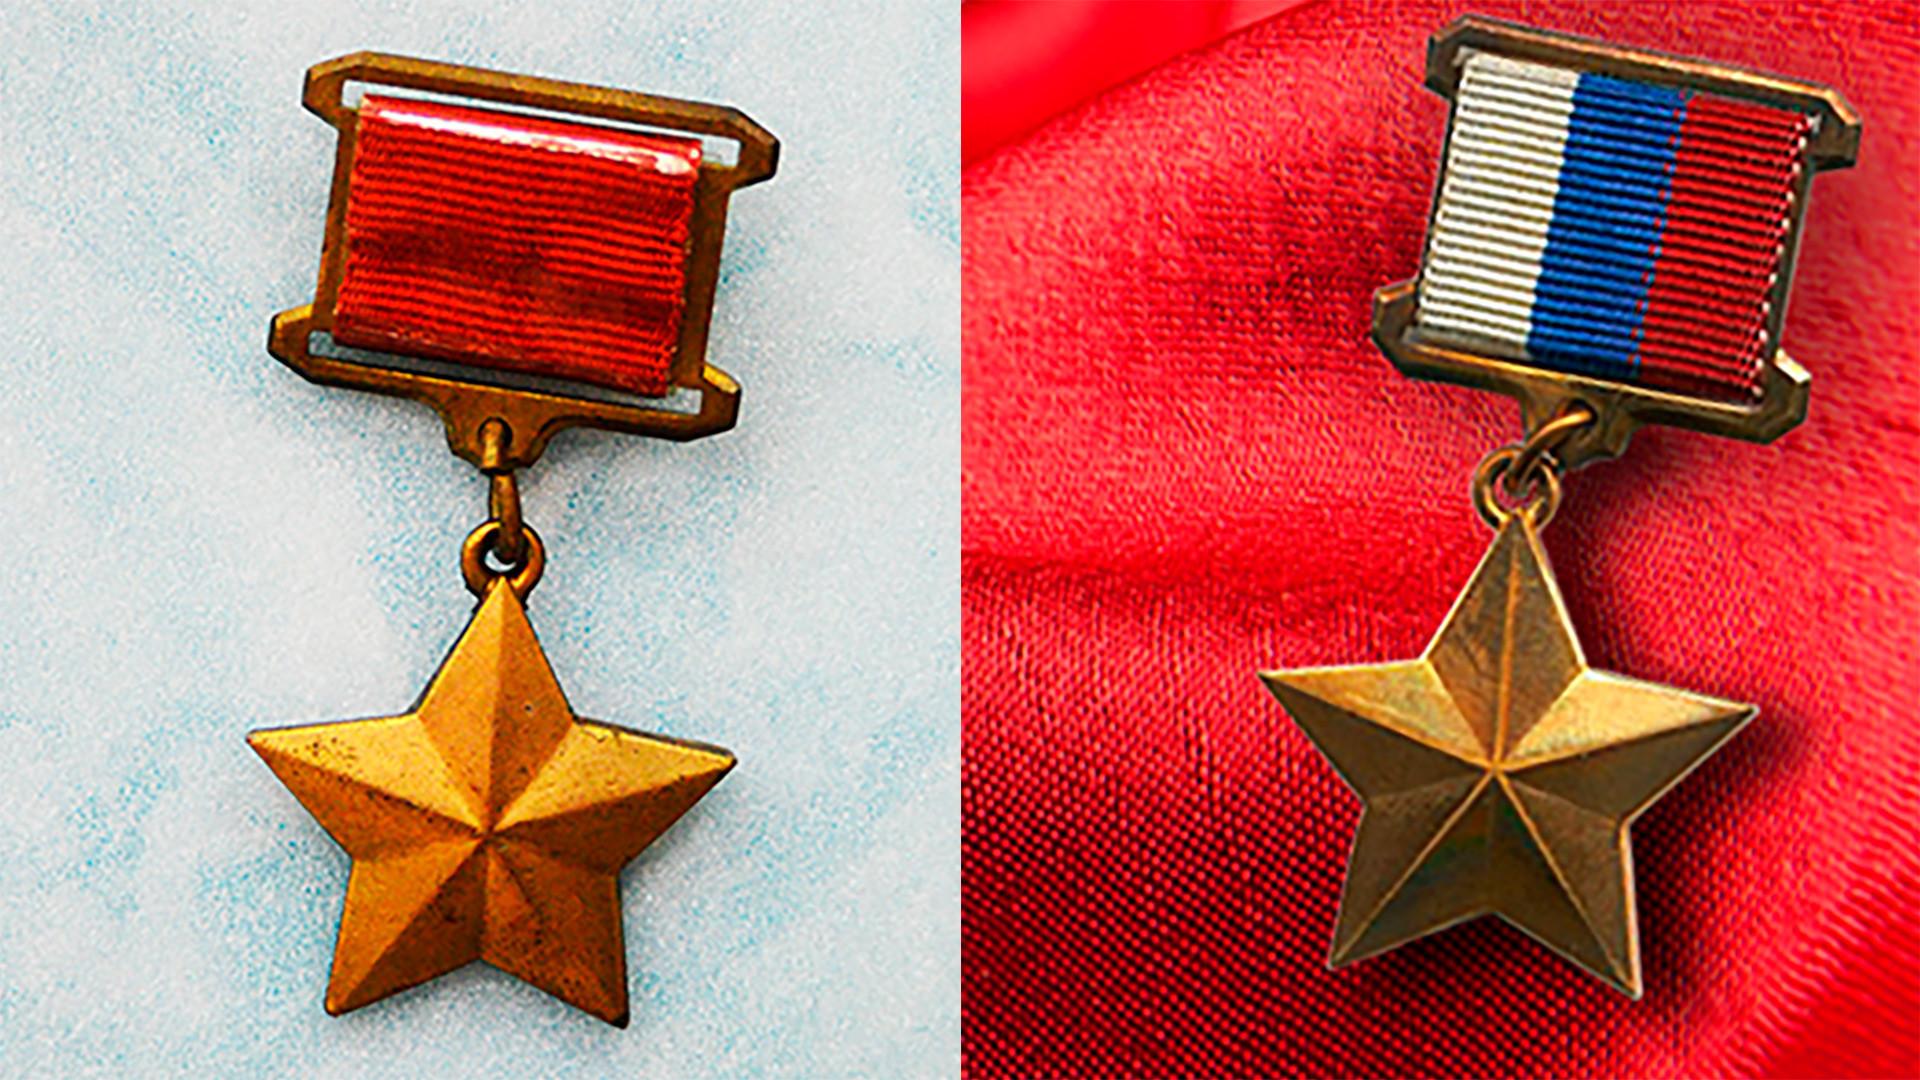 Bintang Emas untuk Pahlawan Negara Uni Soviet dan Pahlawan Negara Federasi Rusia